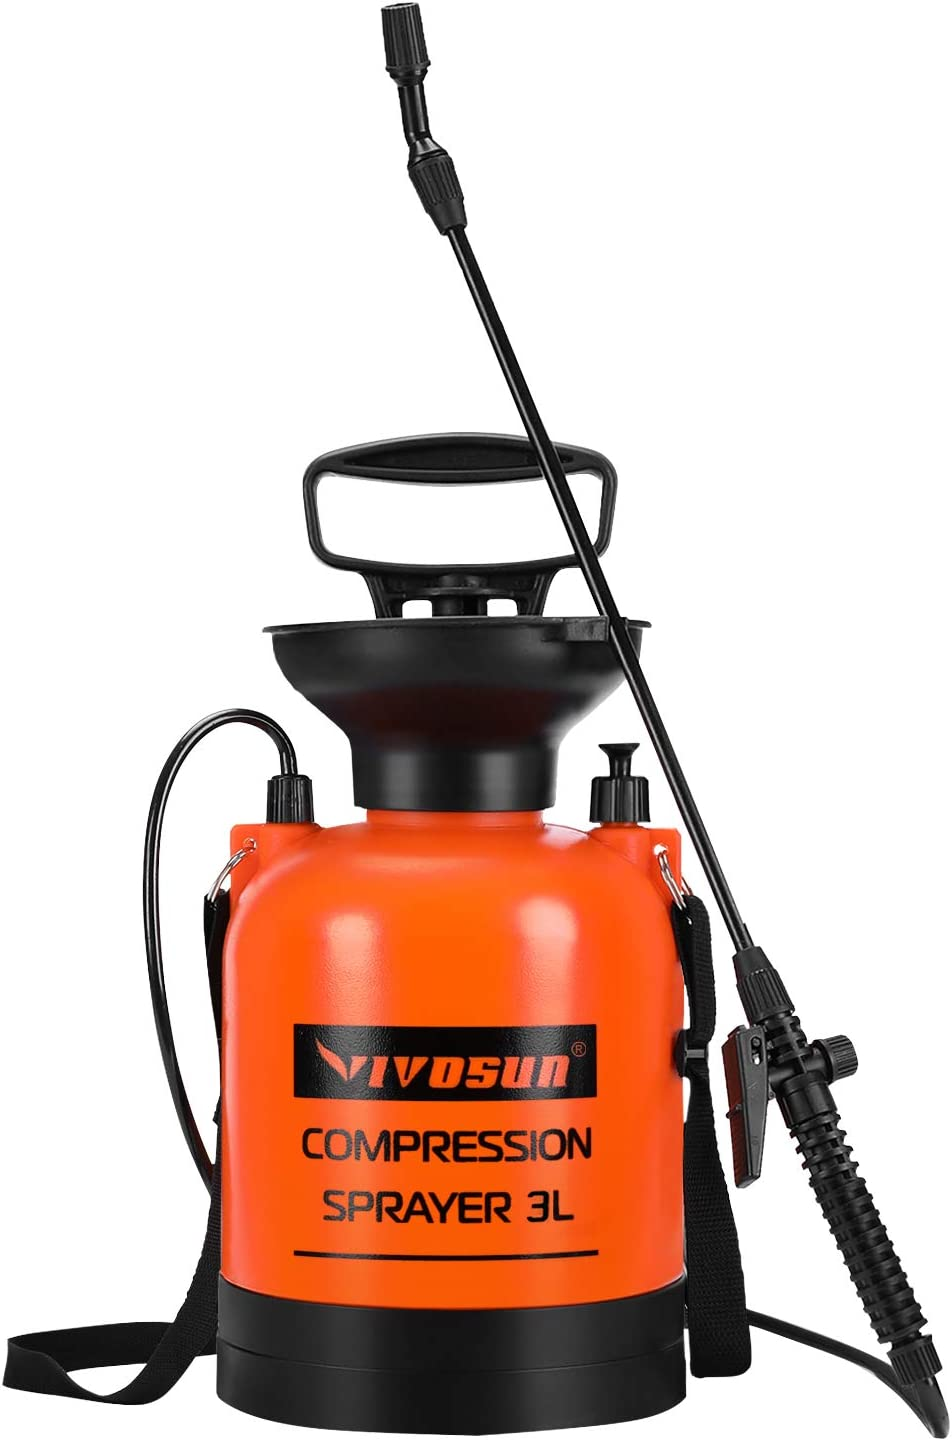 VIVOSUN 0.8 Gallon Lawn and Garden Pump Pressure Sprayer with Pressure Relief Valve, Adjustable Shoulder Strap